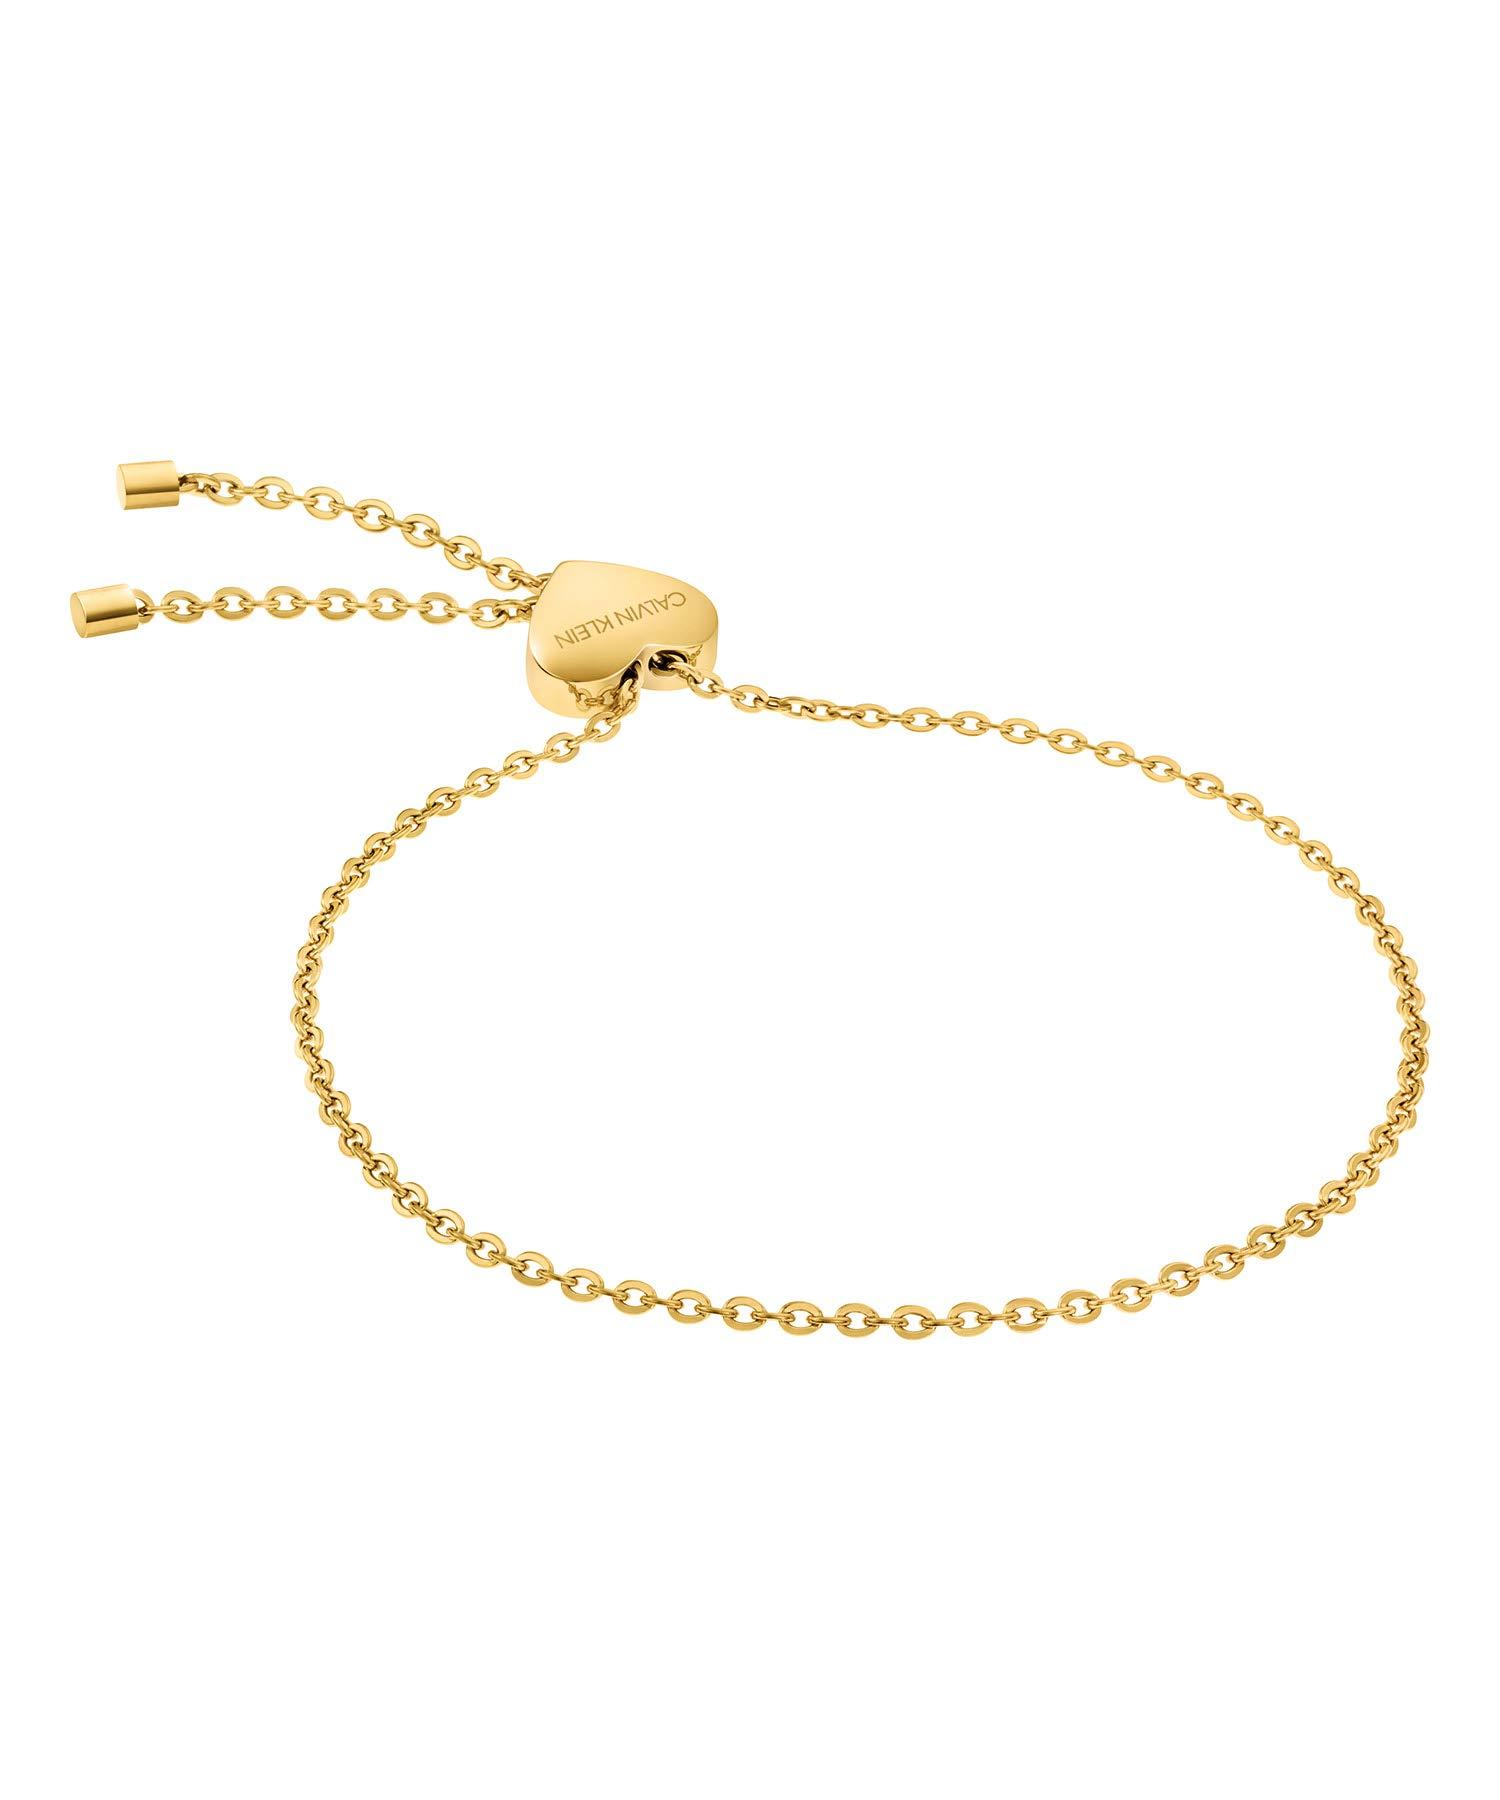 Damen-Armband Edelstahl 32001130